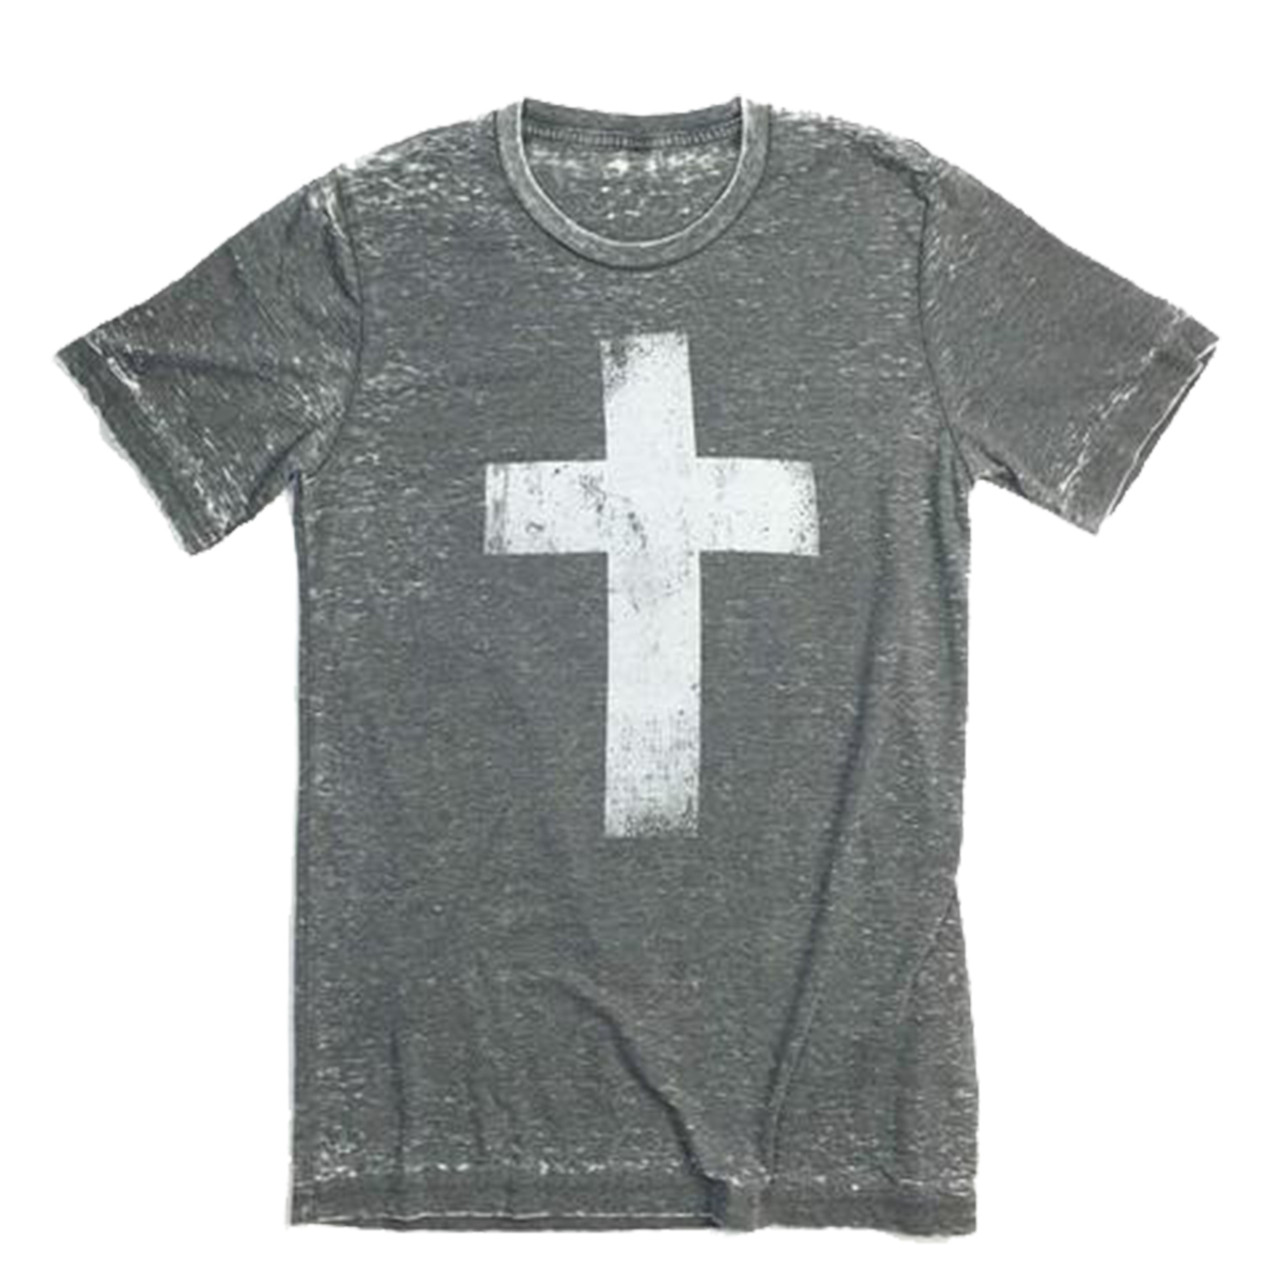 425a974ae7 Crazy Cool Threads Cross Acid Wash T-shirt - Trenz Shirt Company